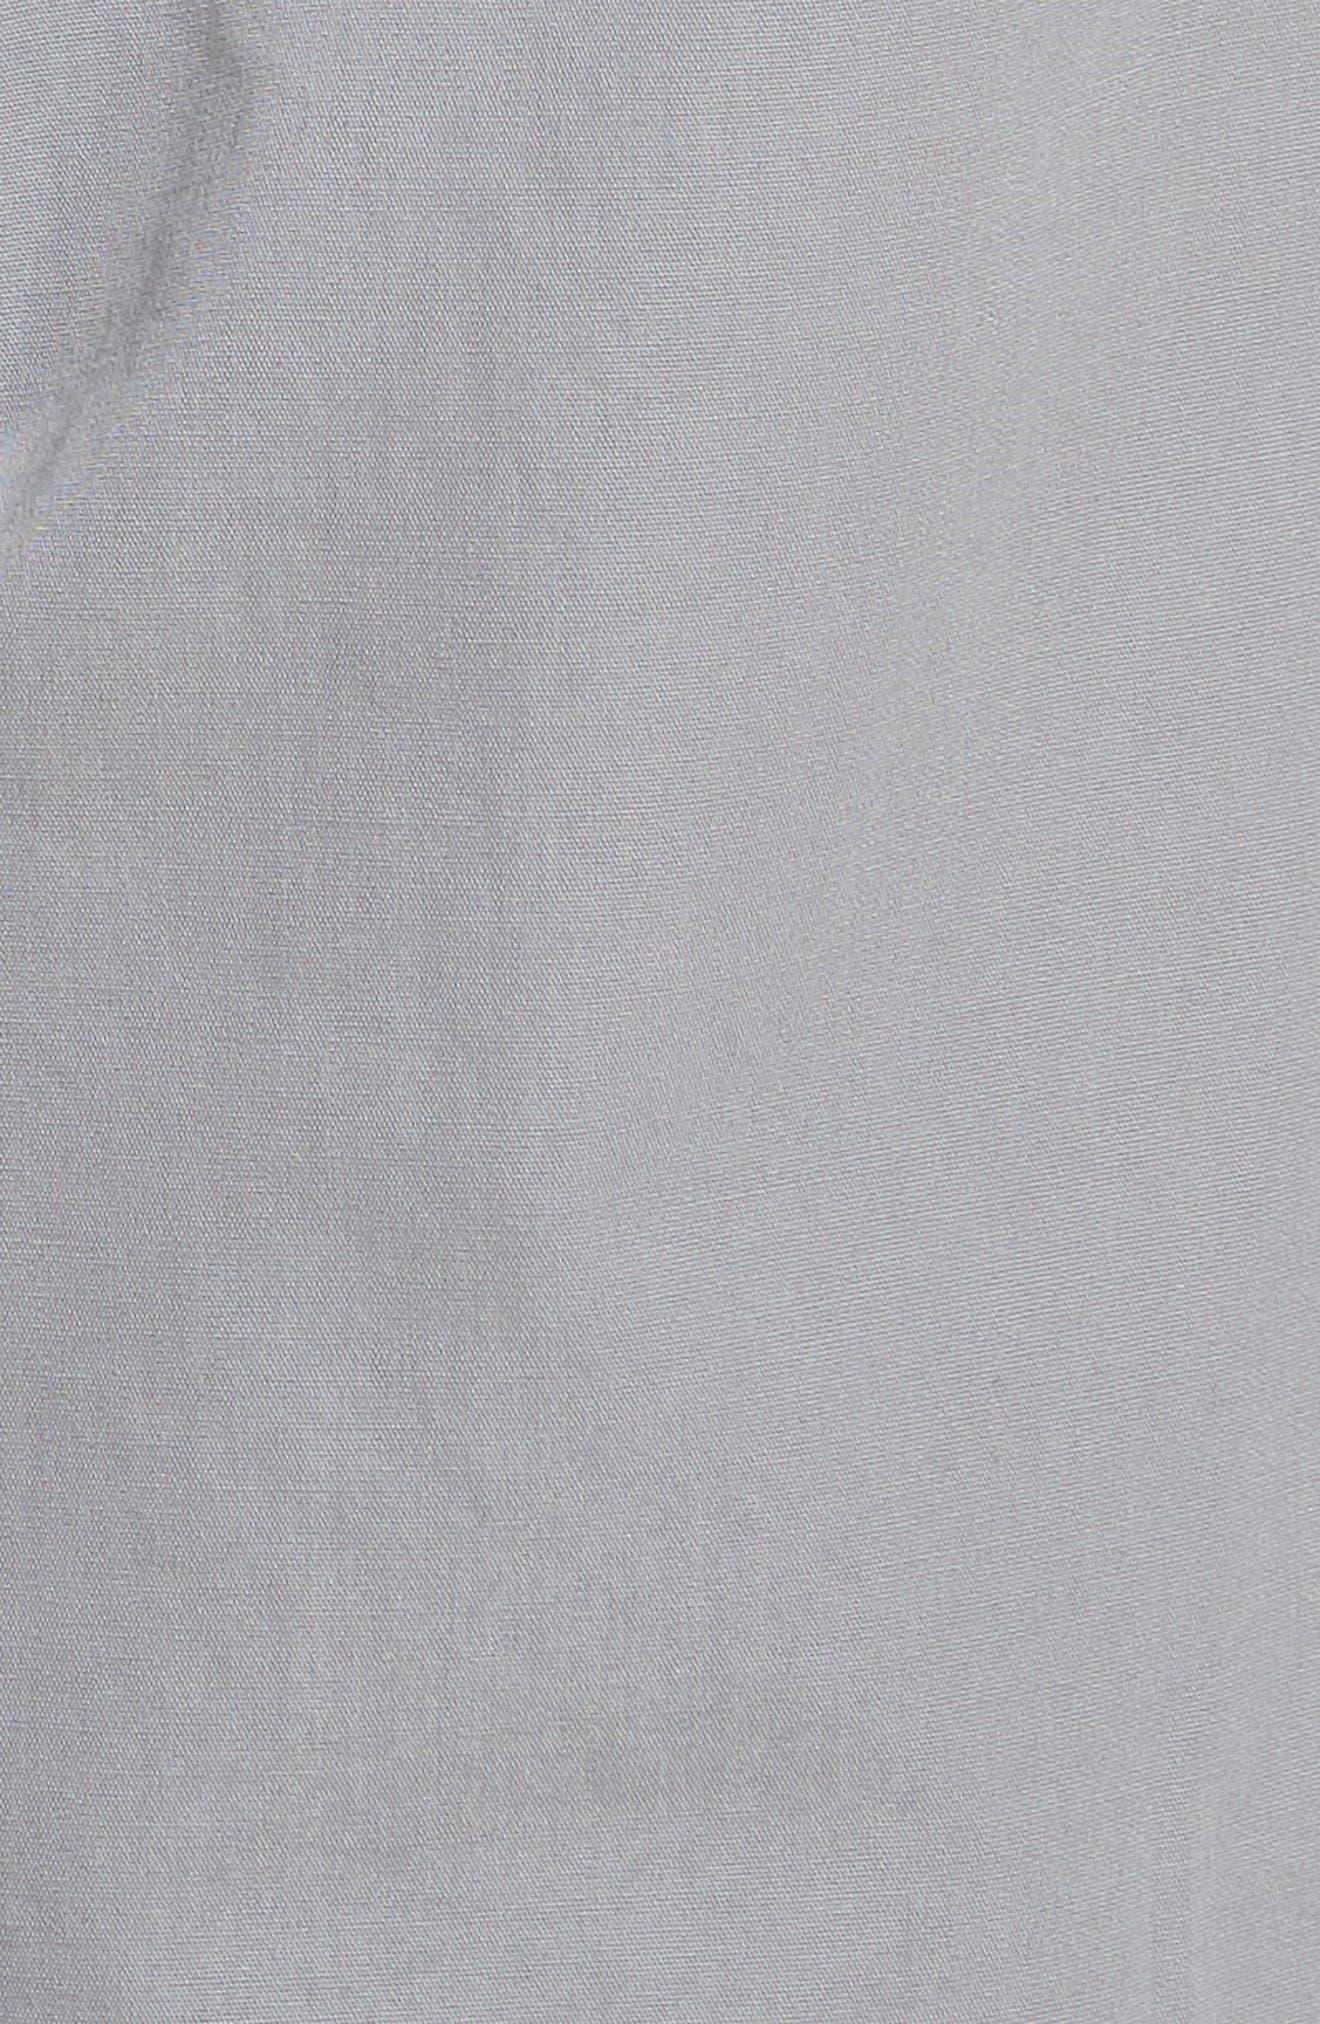 M2 Classic Fit Flat Front Tropical Cotton Poplin Pants,                             Alternate thumbnail 5, color,                             Nickel